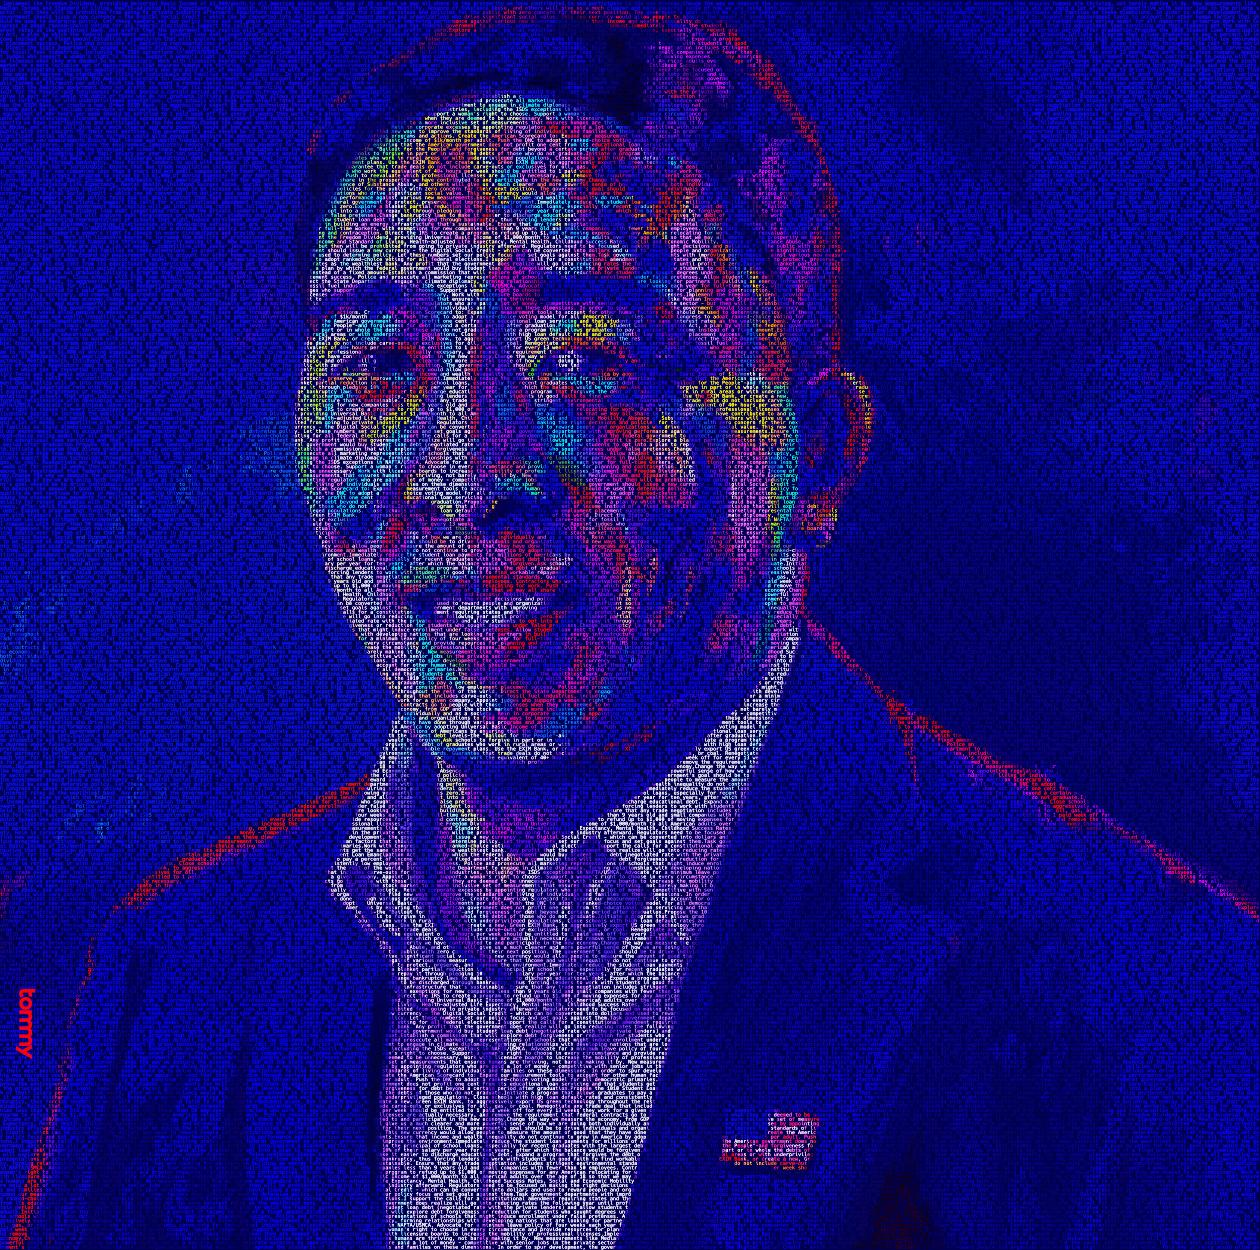 Andrew Yang Policy Portrait 2 #Yang2020 #ArtistsForYang